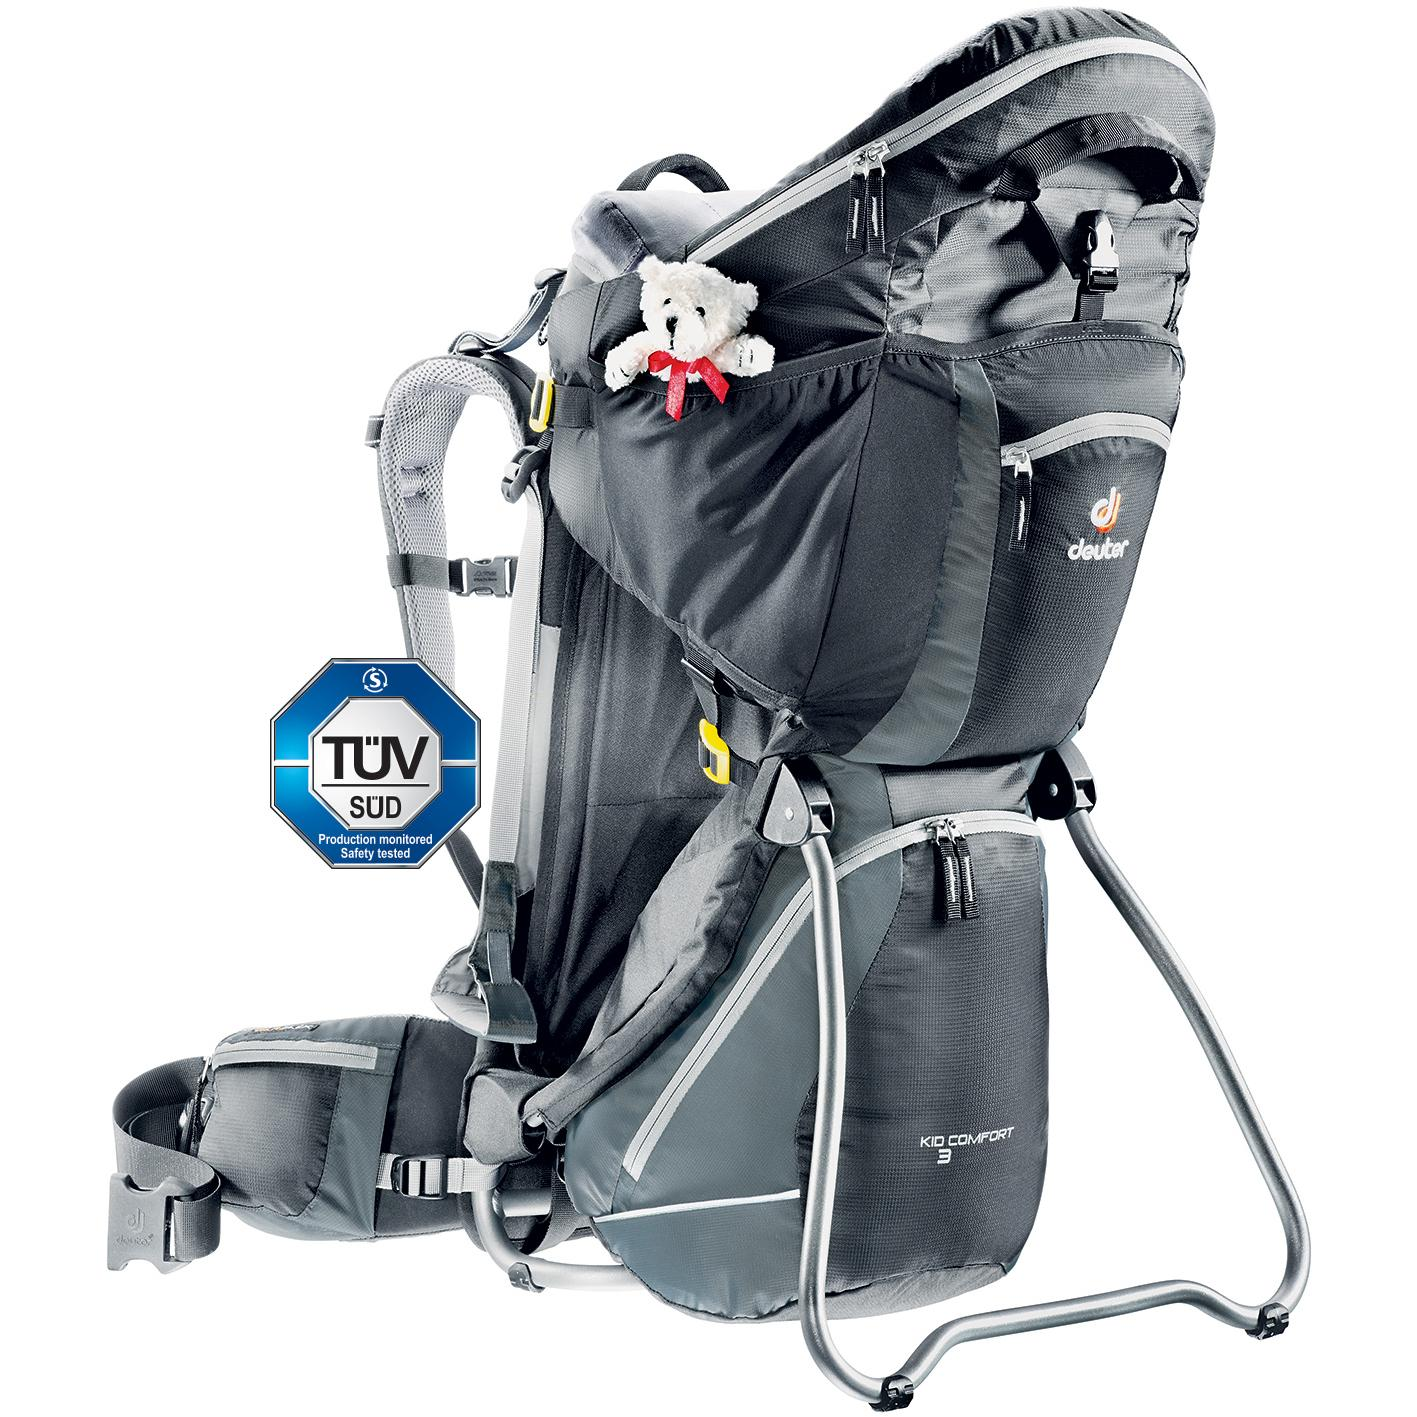 Рюкзак salewa kid carrier comfort купить рюкзак redfox site.kz